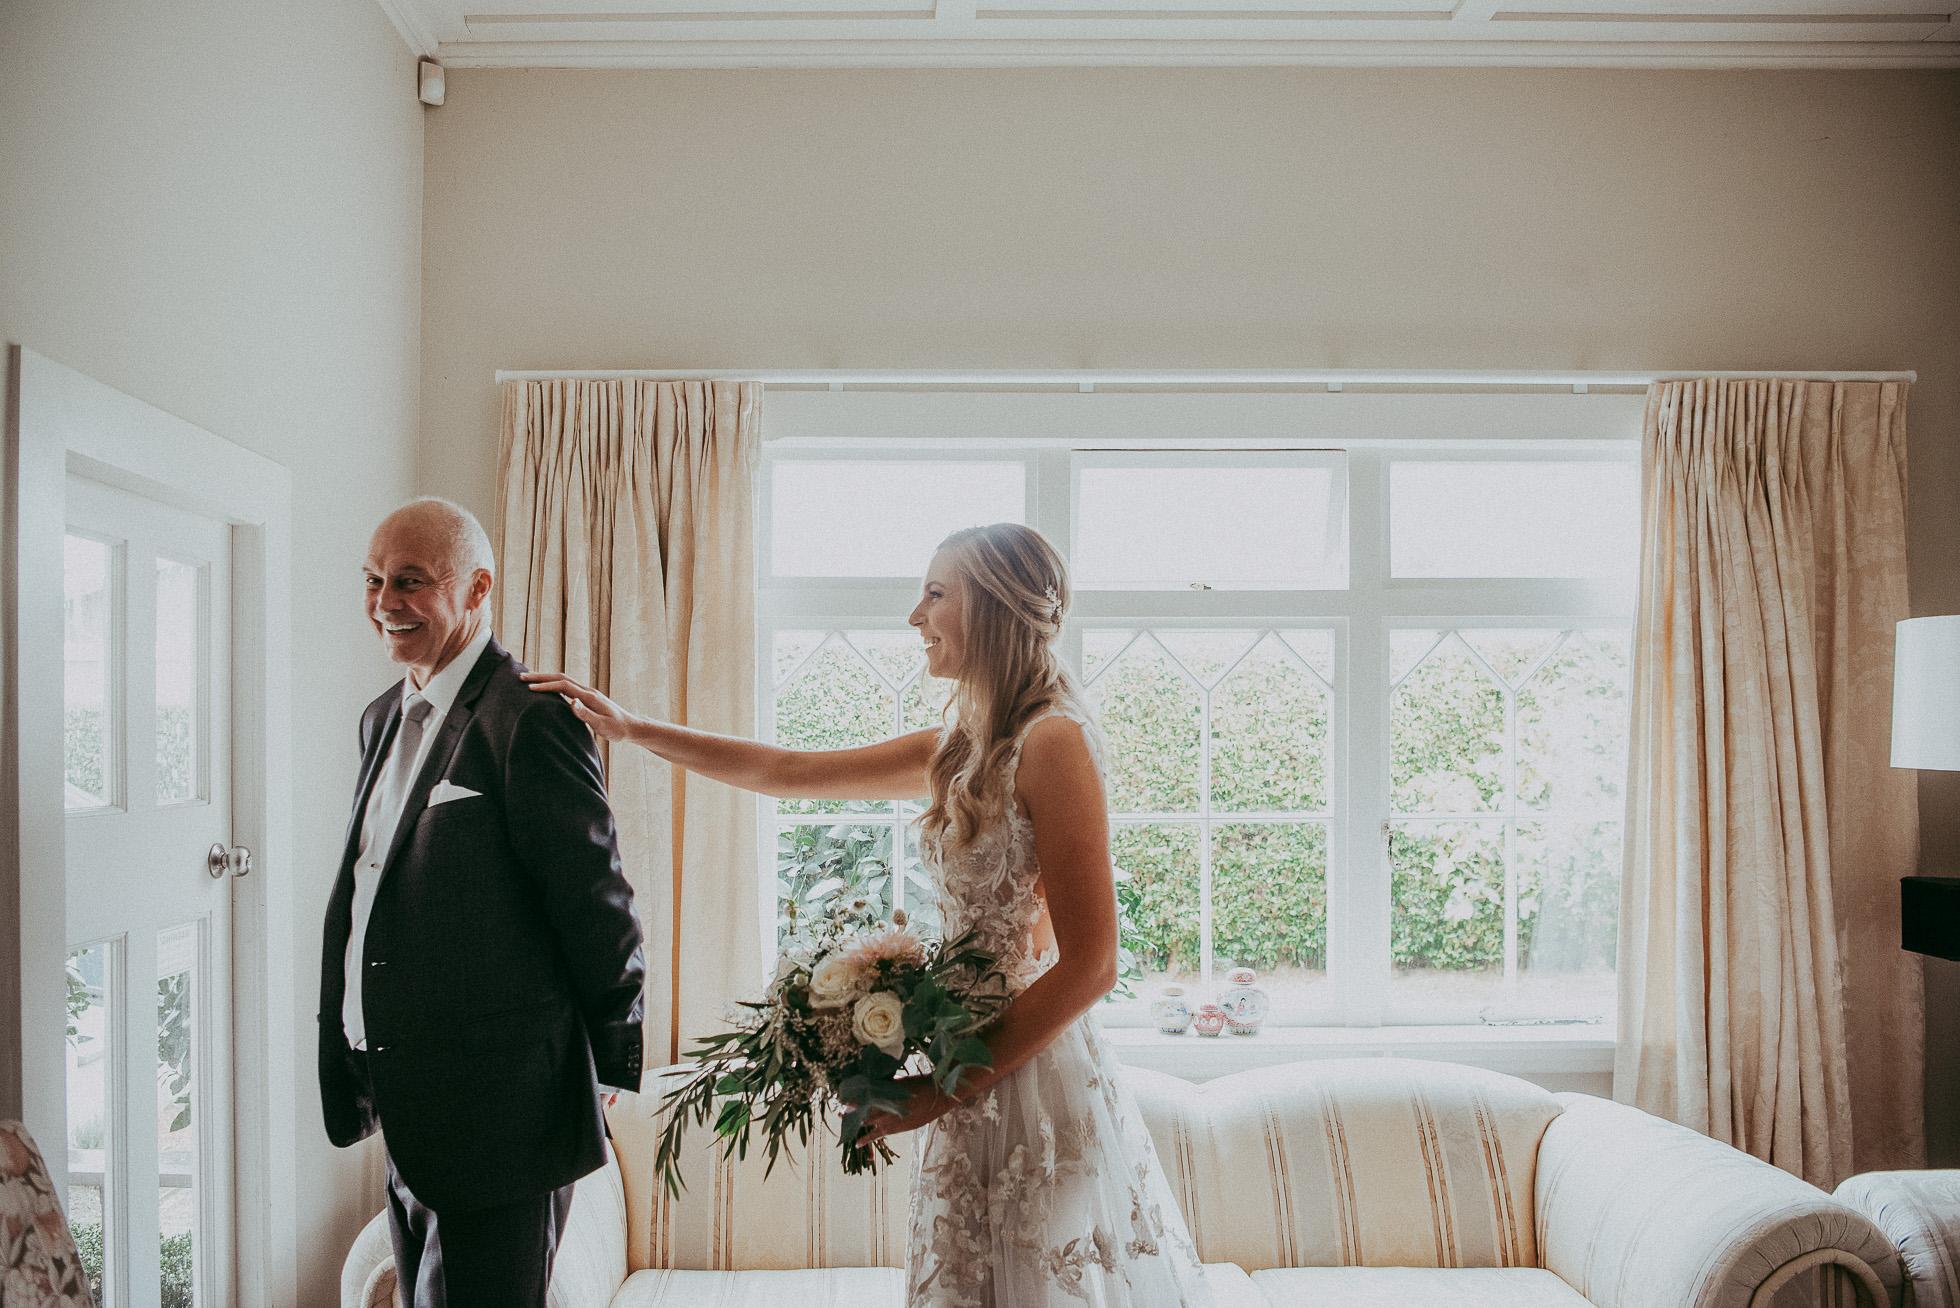 wedding-by-levien-186.JPG